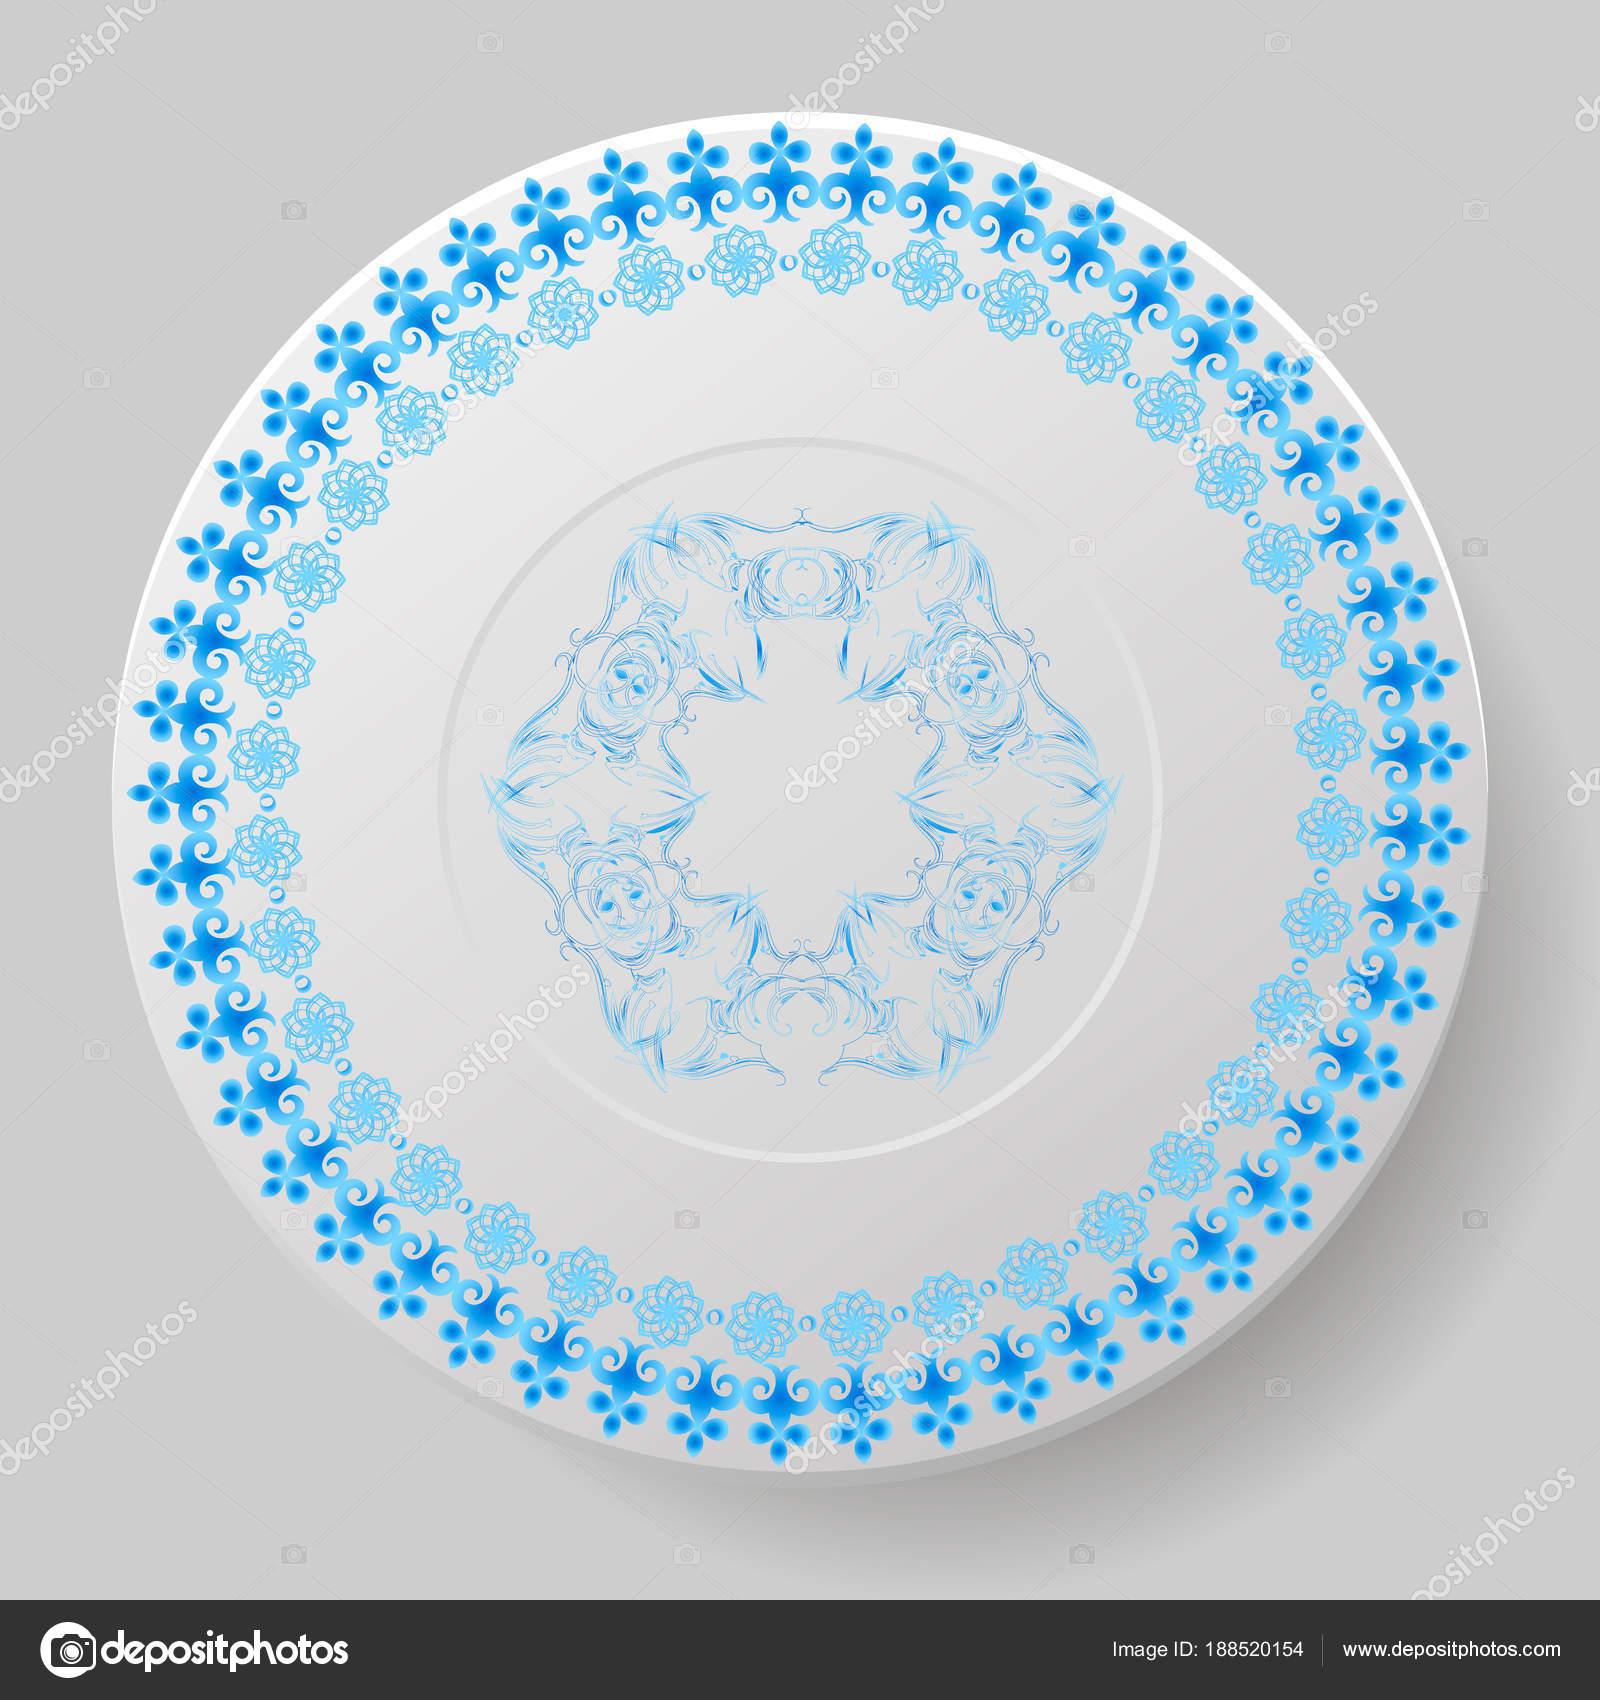 Beautiful Plate Decorated Blue Ornament u2014 Stock Vector  sc 1 st  Depositphotos & Beautiful Plate Decorated Blue Ornament u2014 Stock Vector © Oreora ...